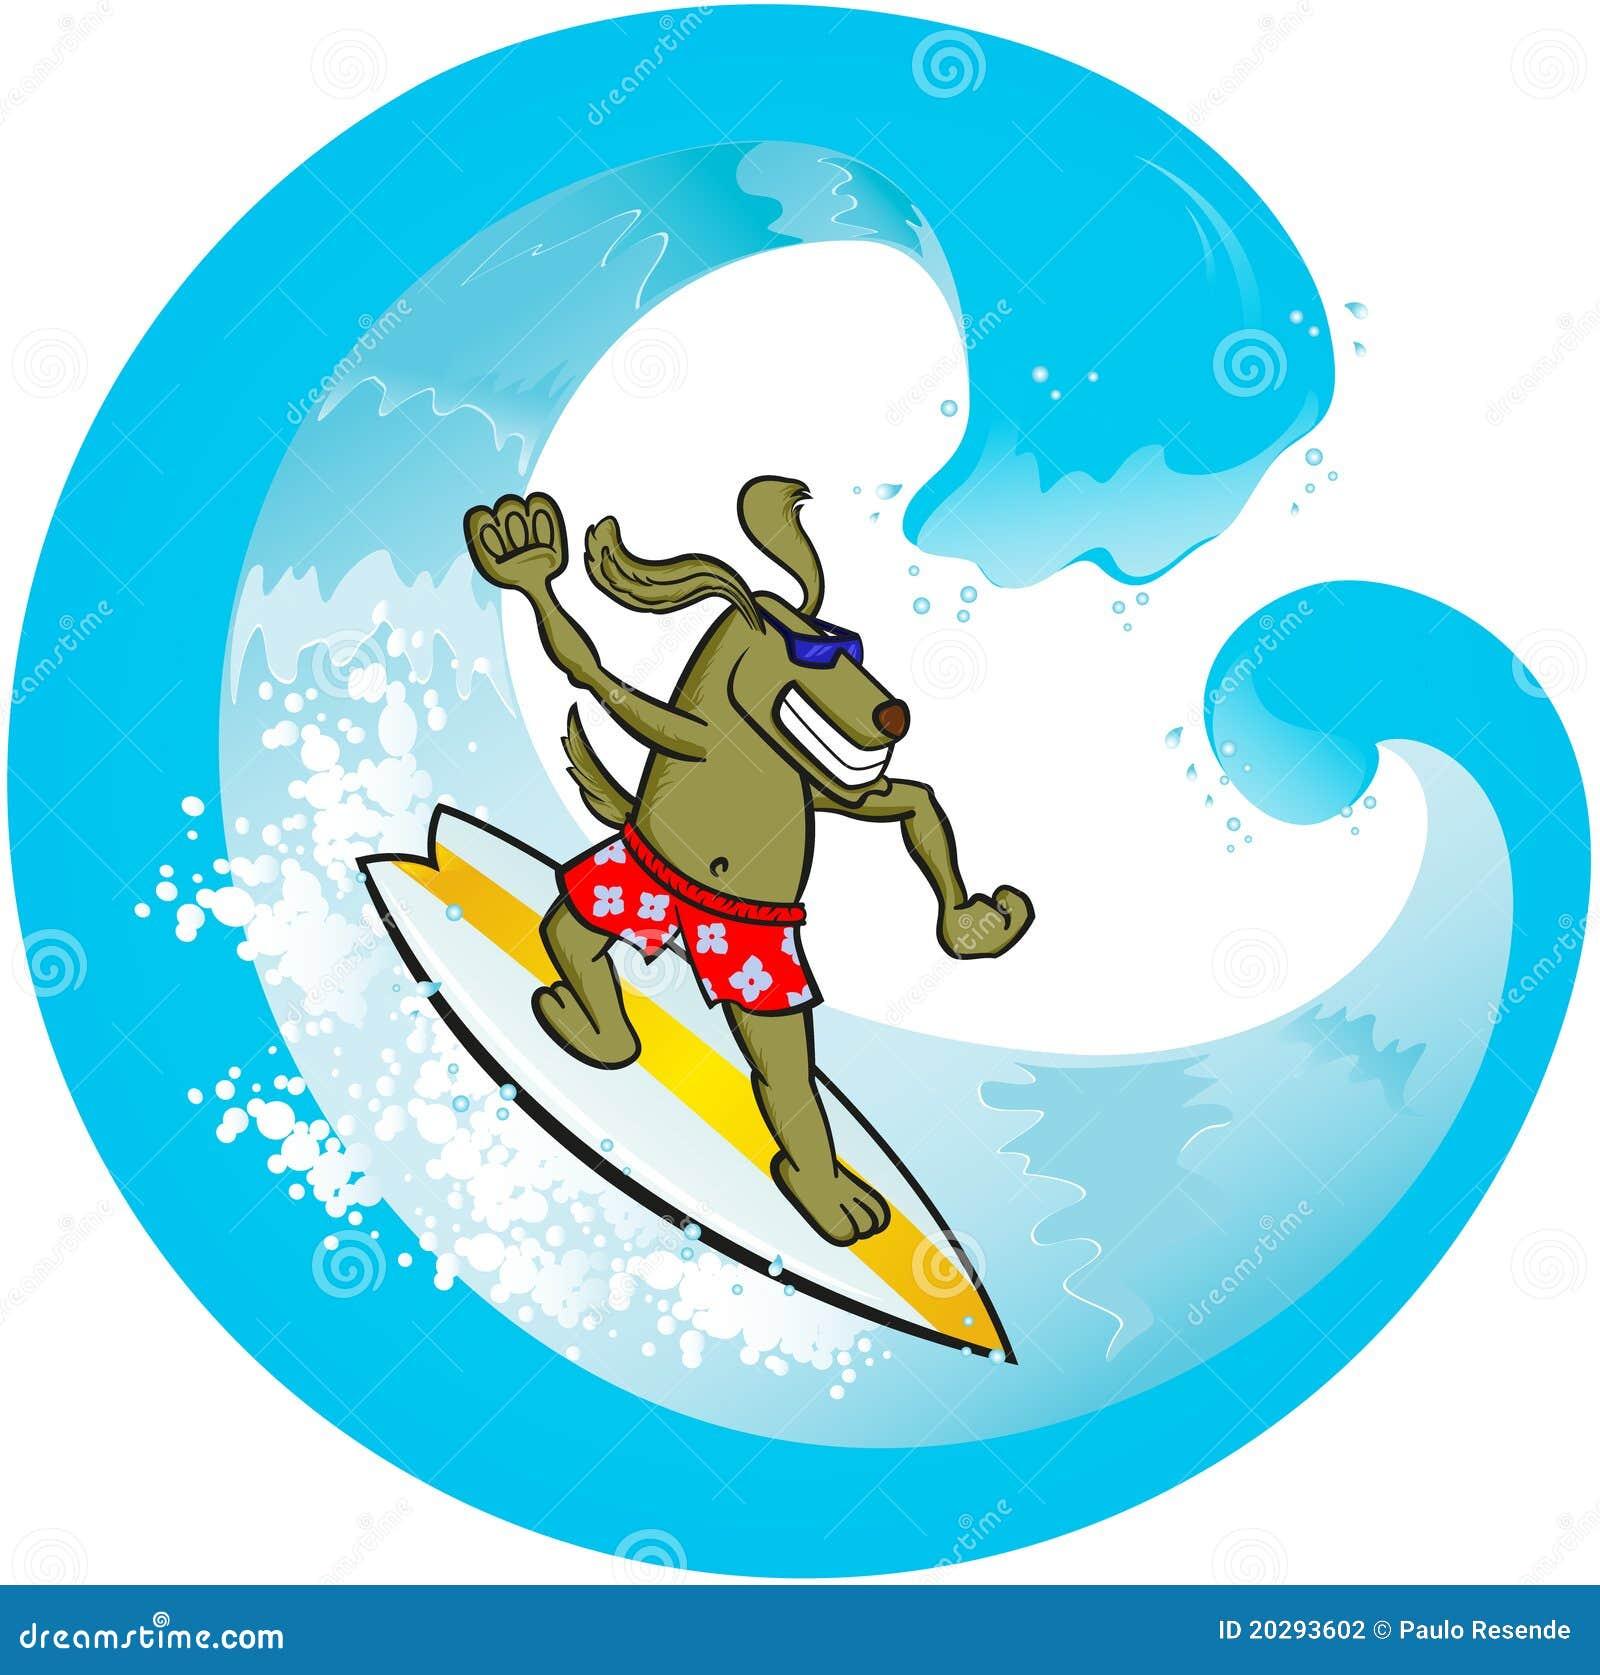 Surf dog stock vector. Illustration of cartoon, beach ...